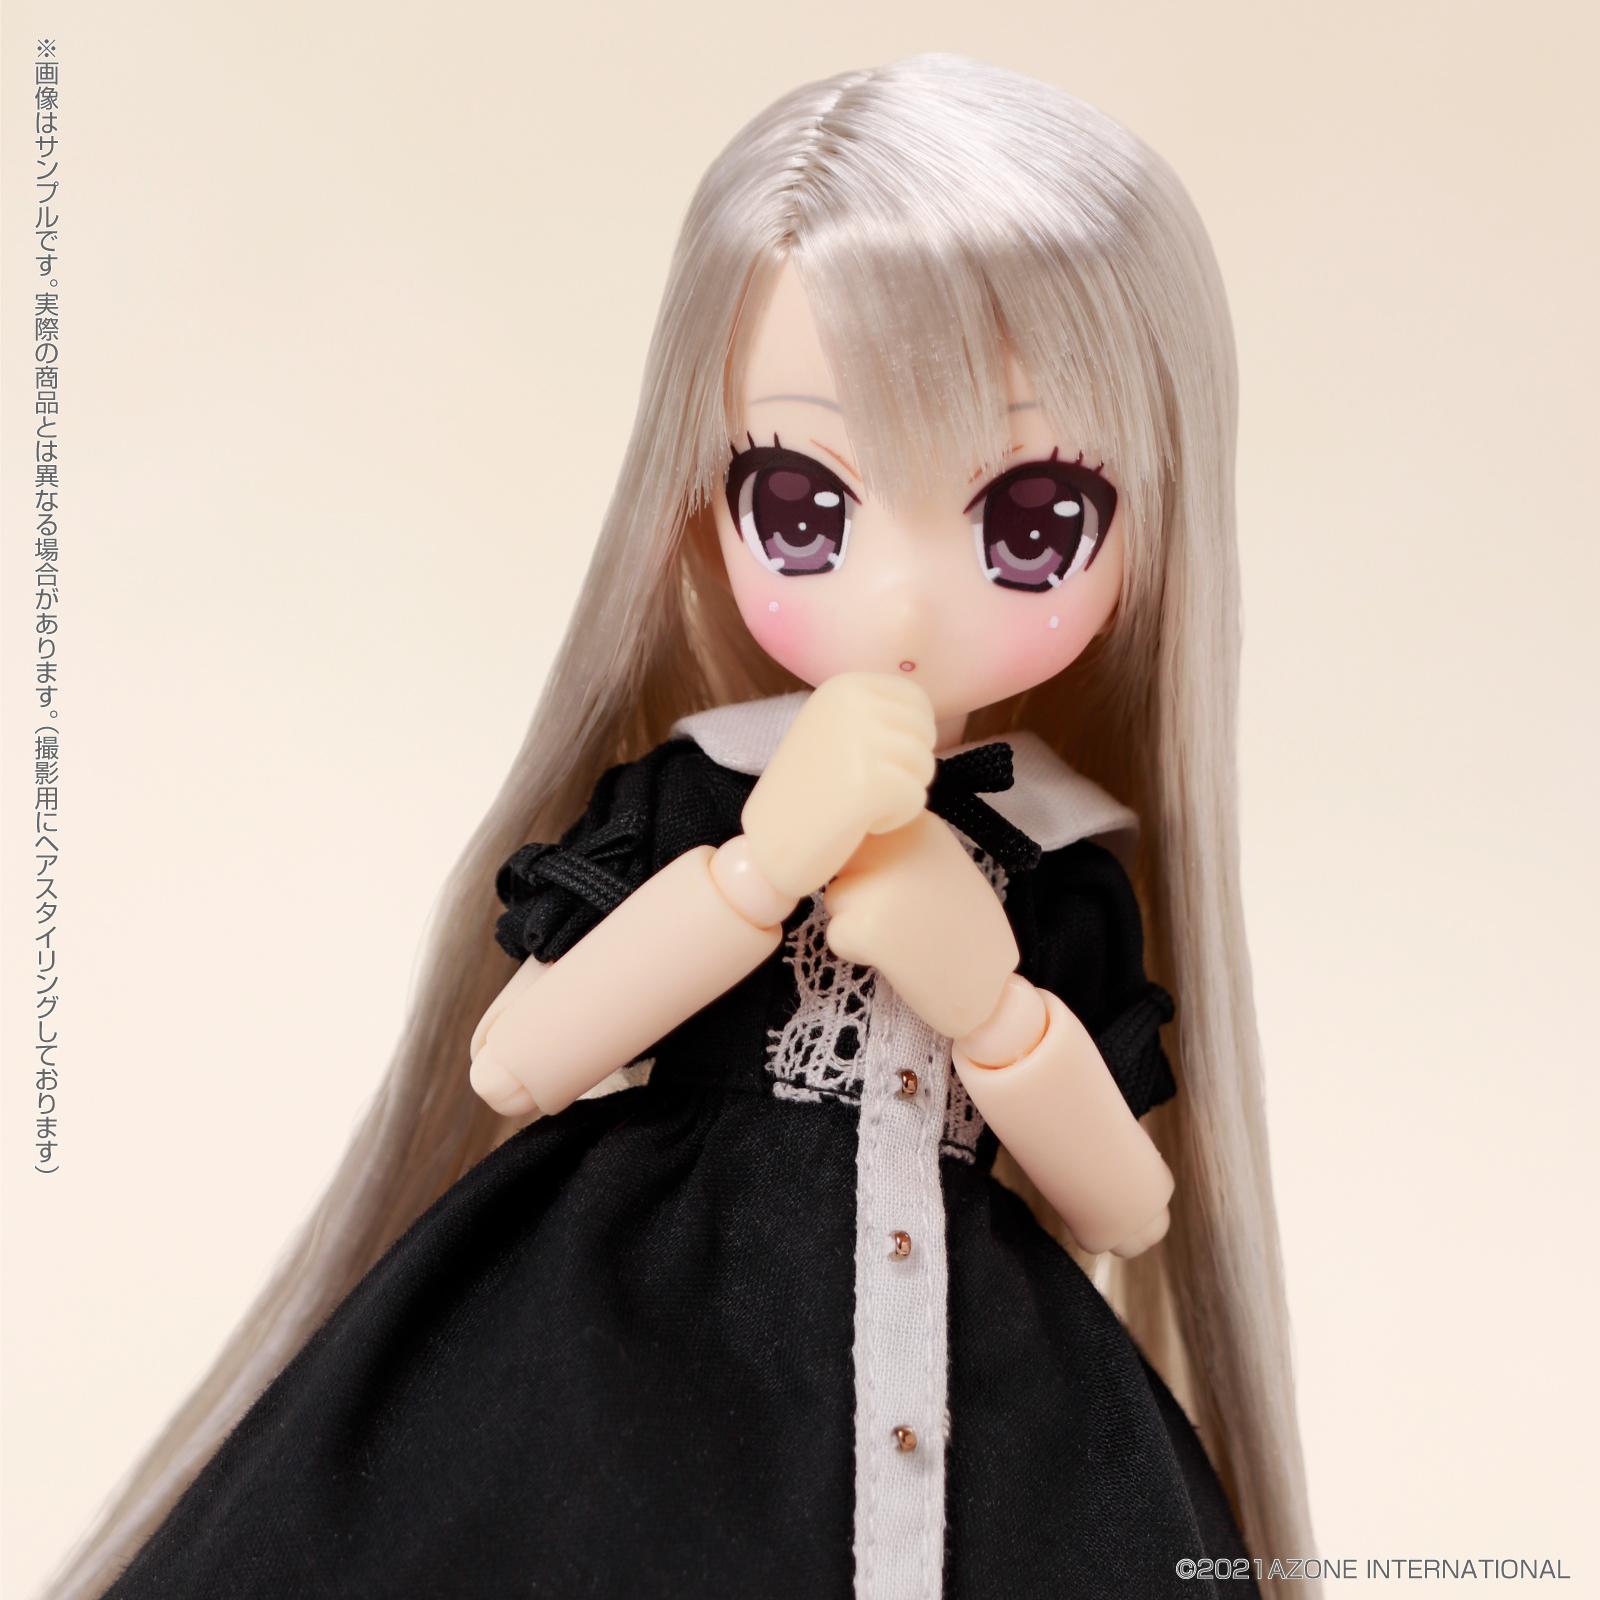 Lil'Fairy ~ちいさなお手伝いさん~『ヴェル 7th anniv.(ノーマル口ver.)』1/12 完成品ドール-015